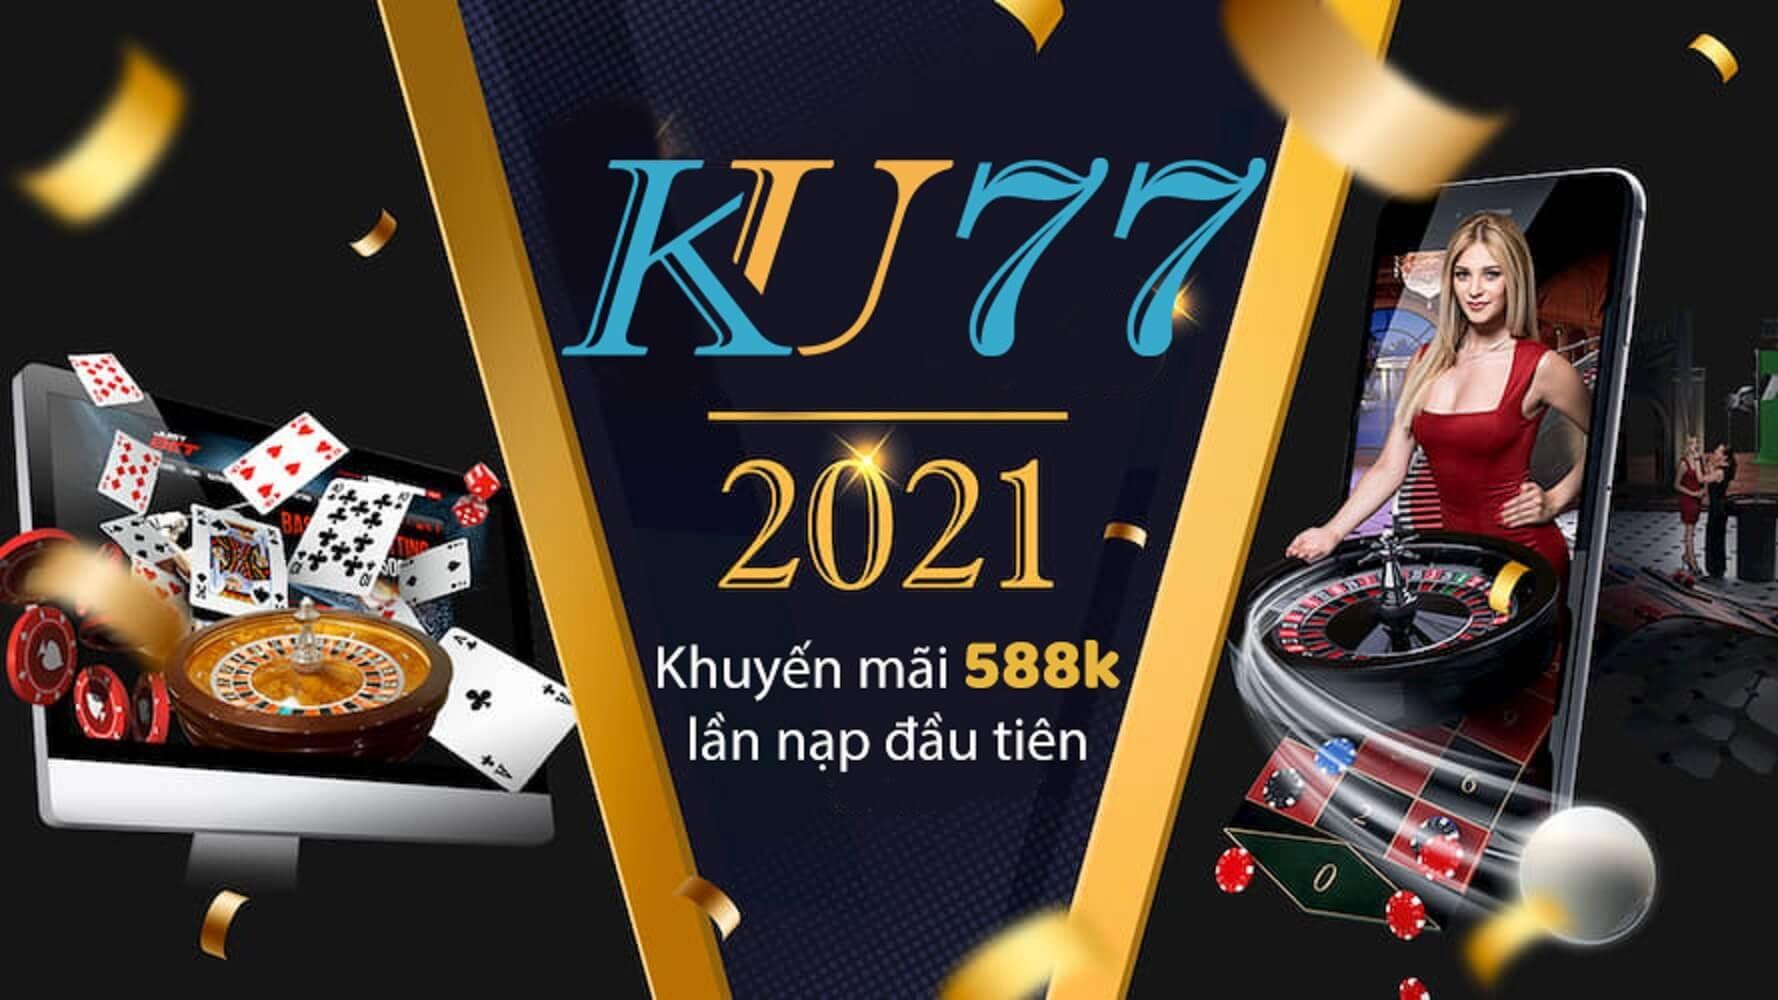 Ku77 Ku Casino nhà cái Kubet uy tín (@ku77casino) Cover Image